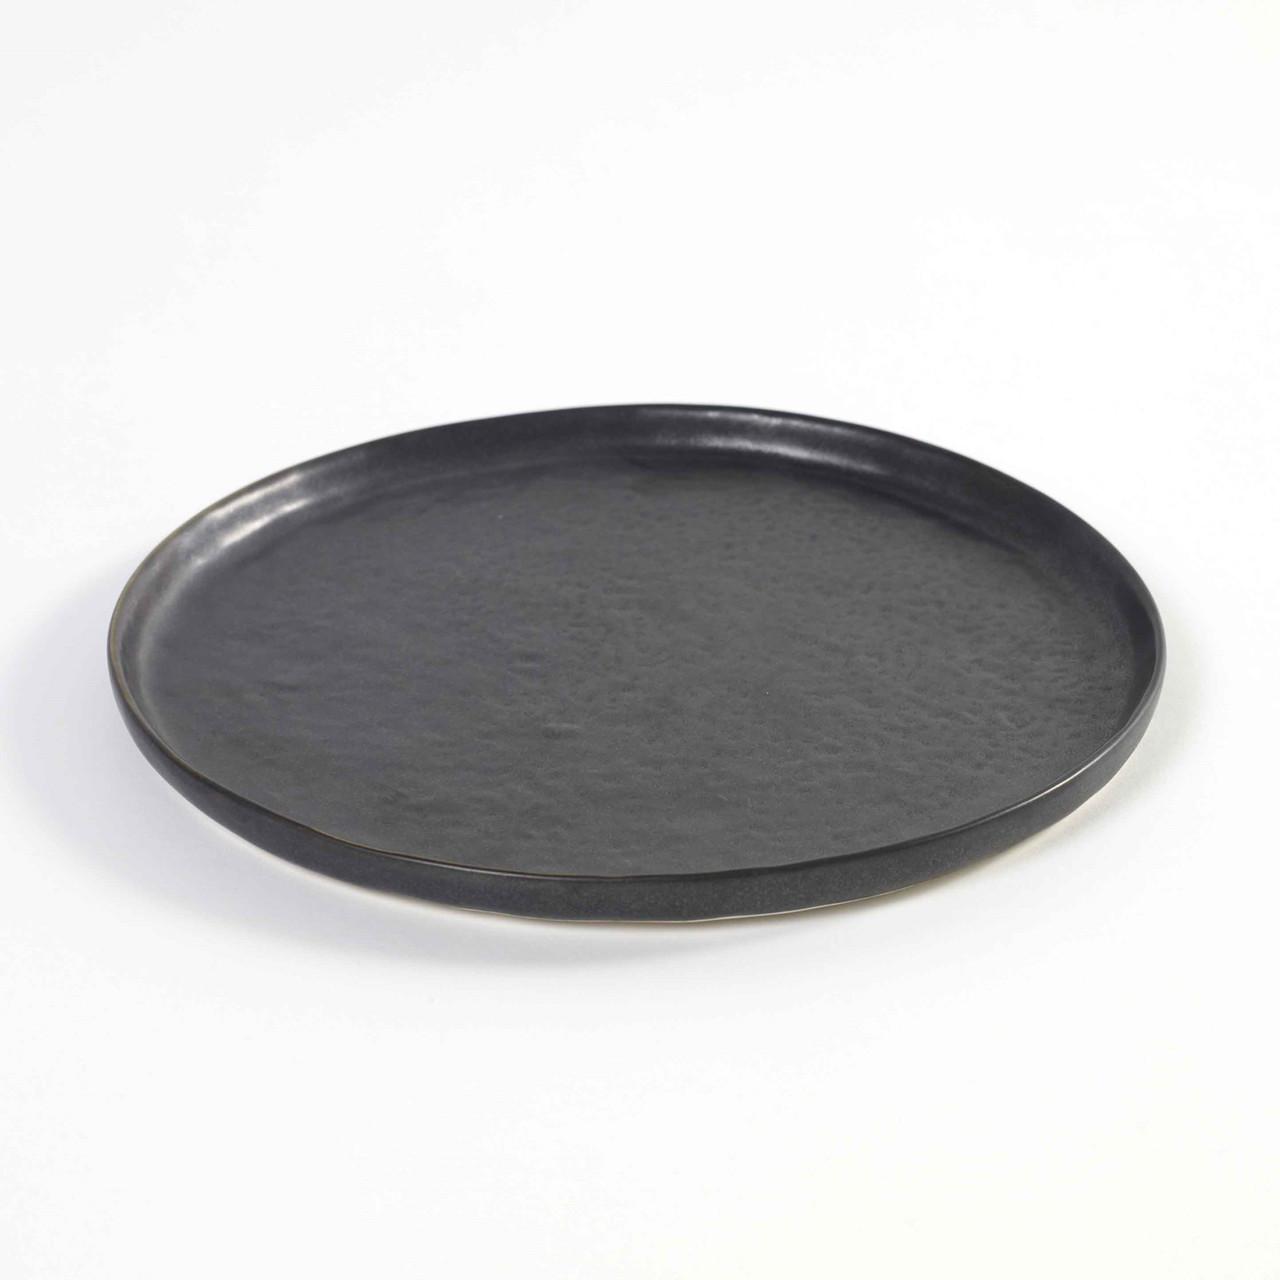 Serax Plate Black – pris 95.00